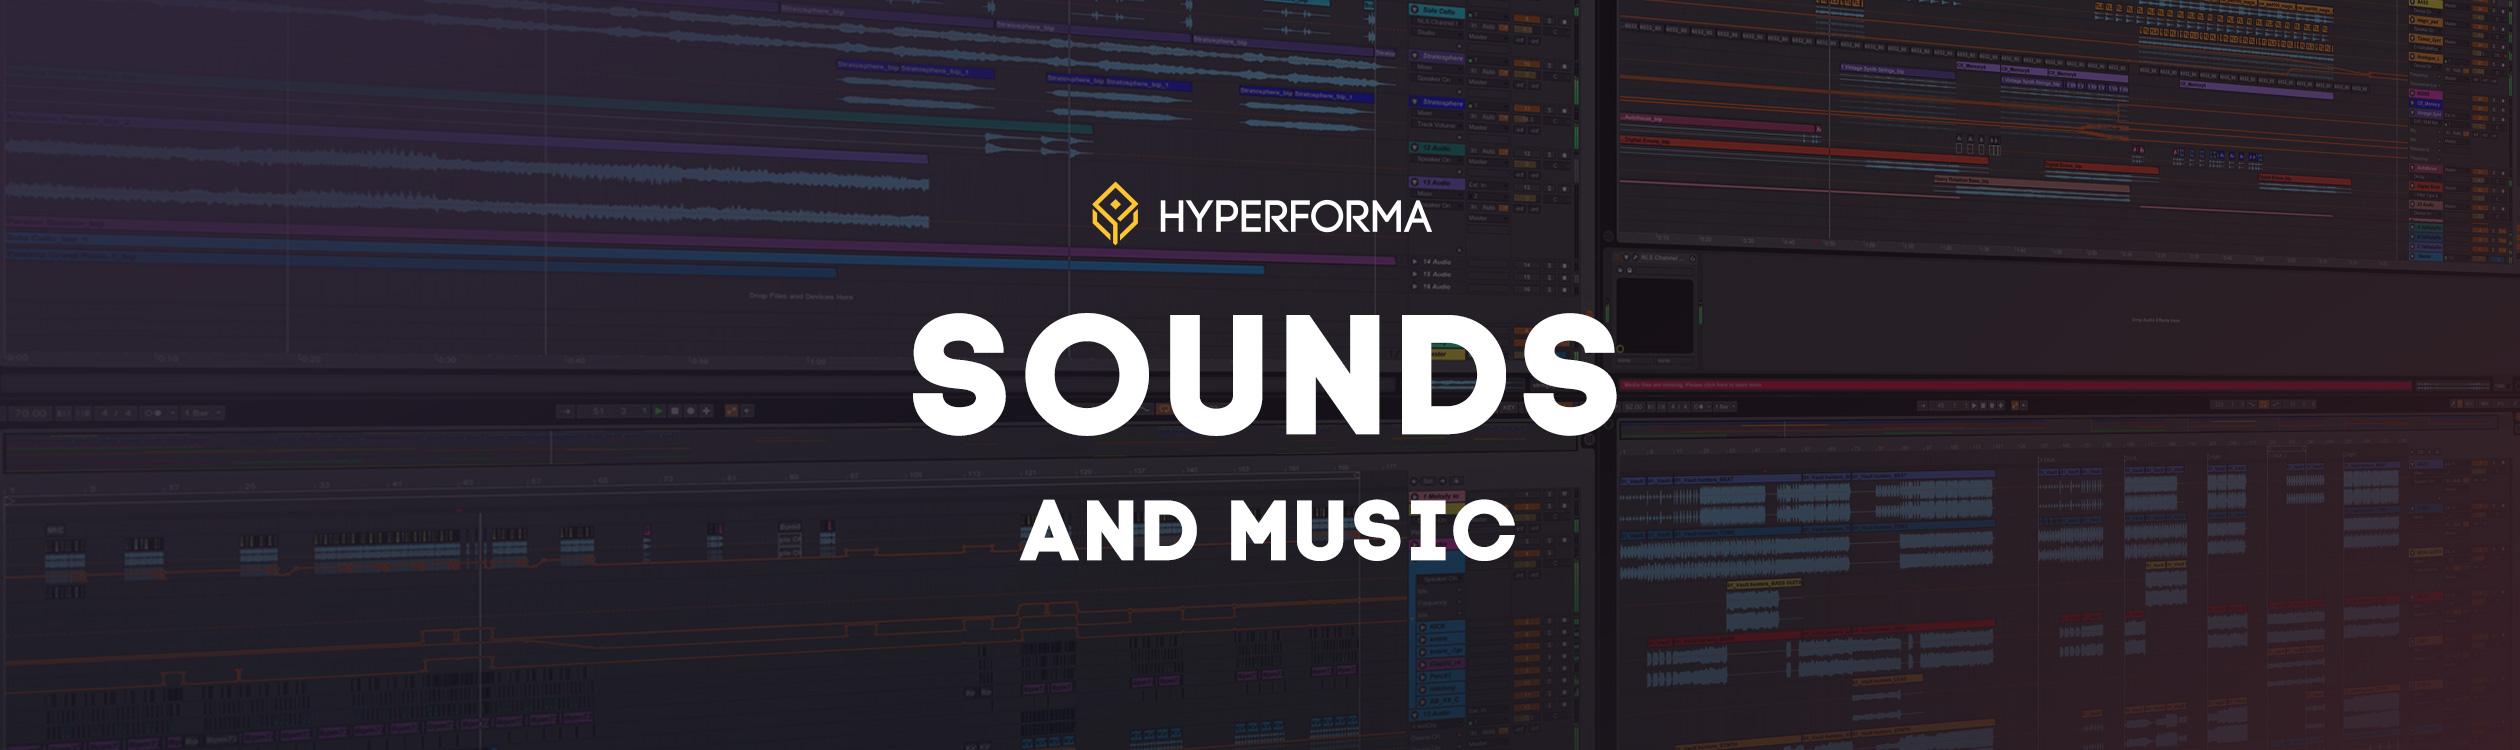 fface_sounds